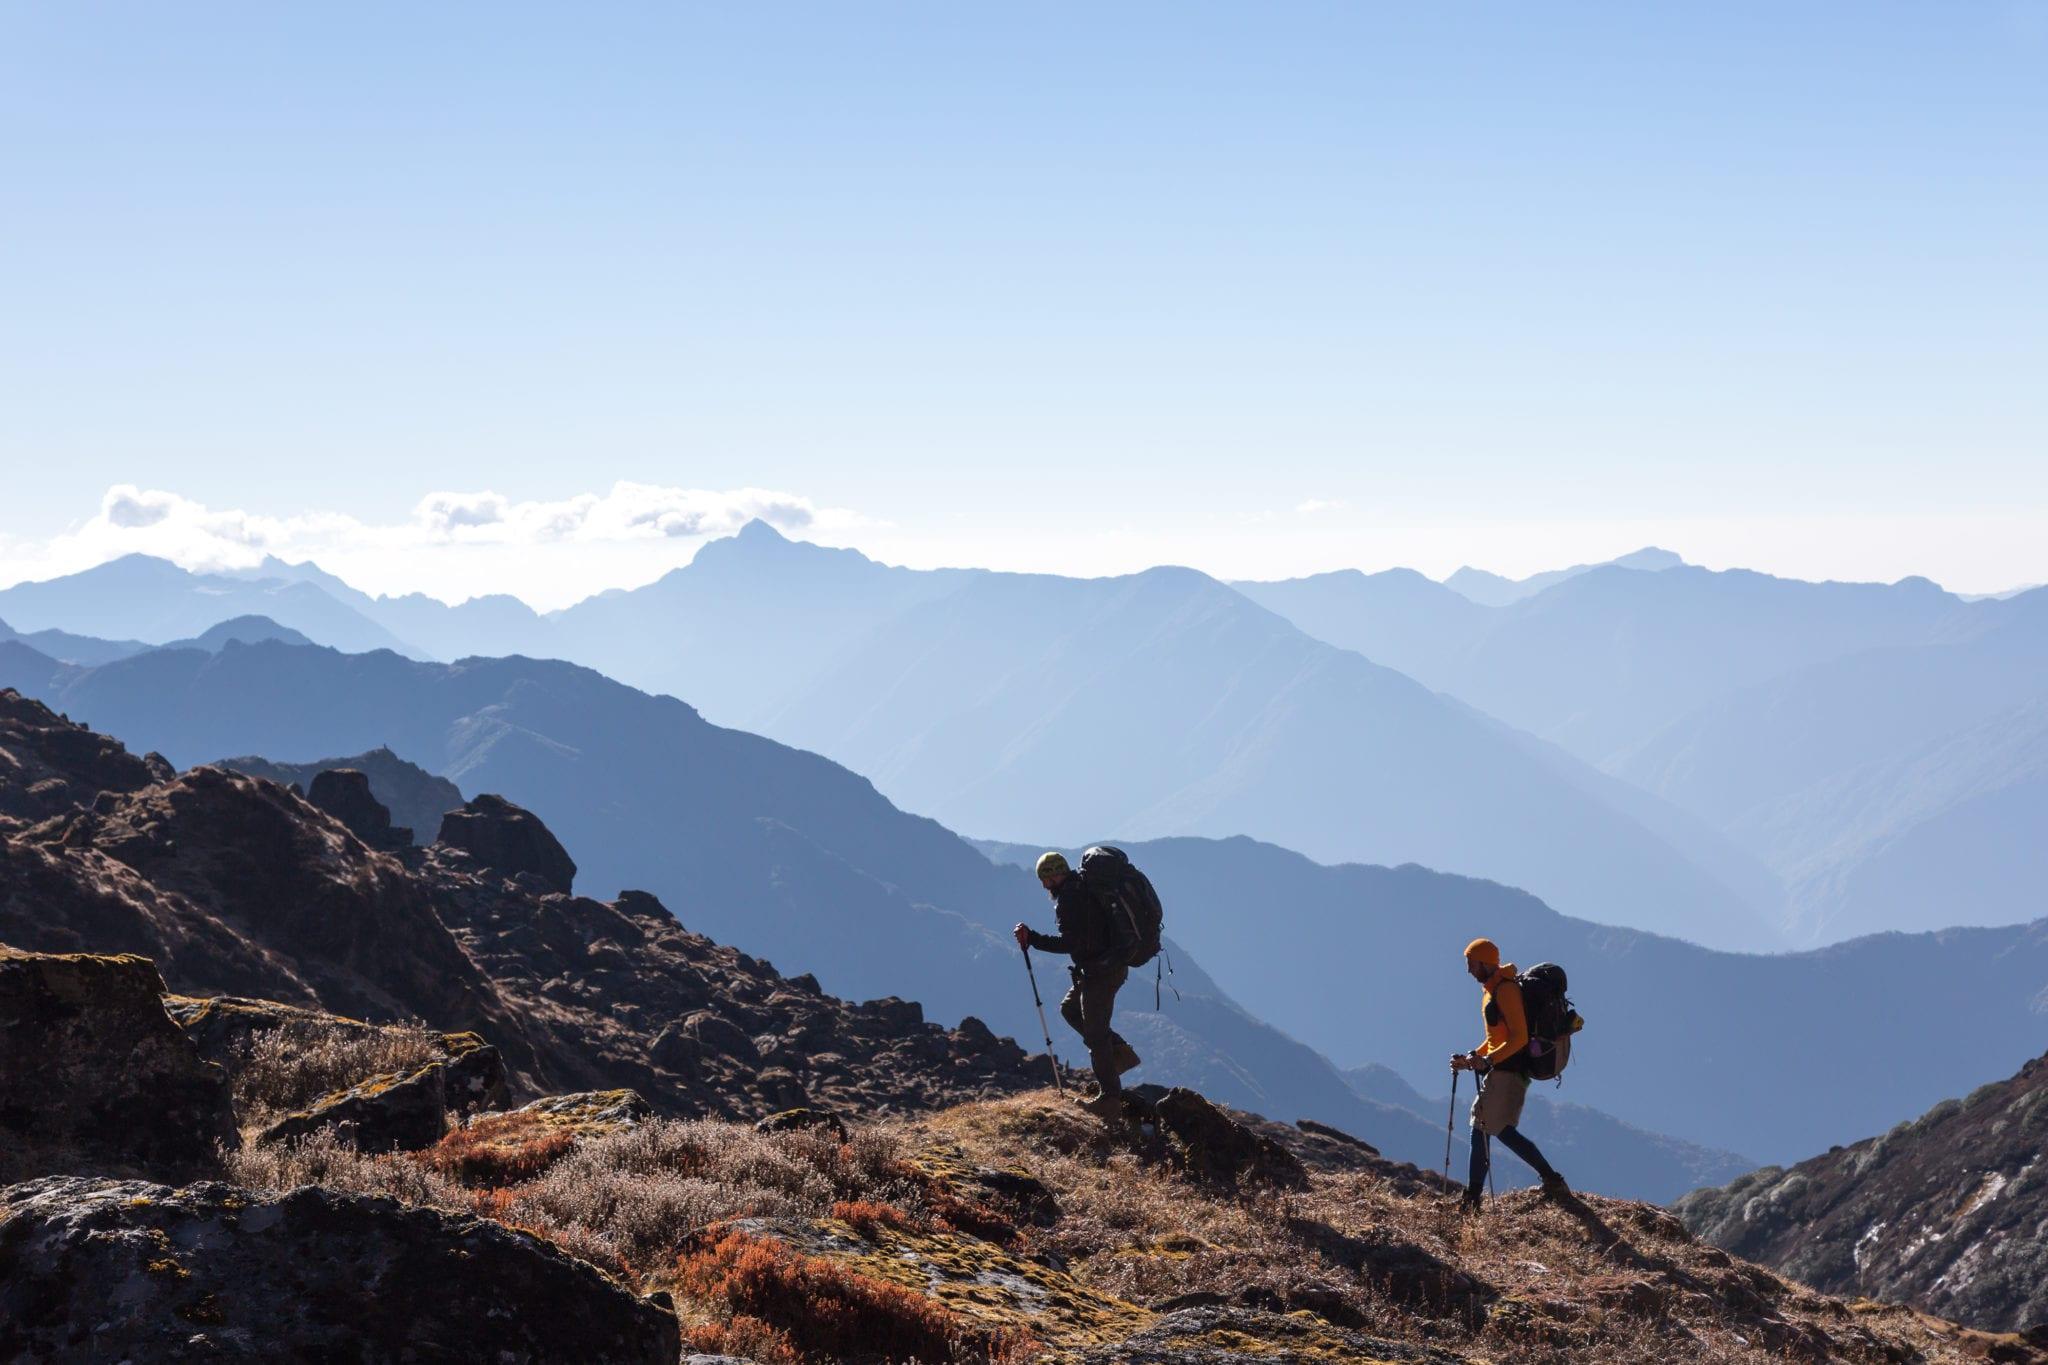 mountaineering insurance